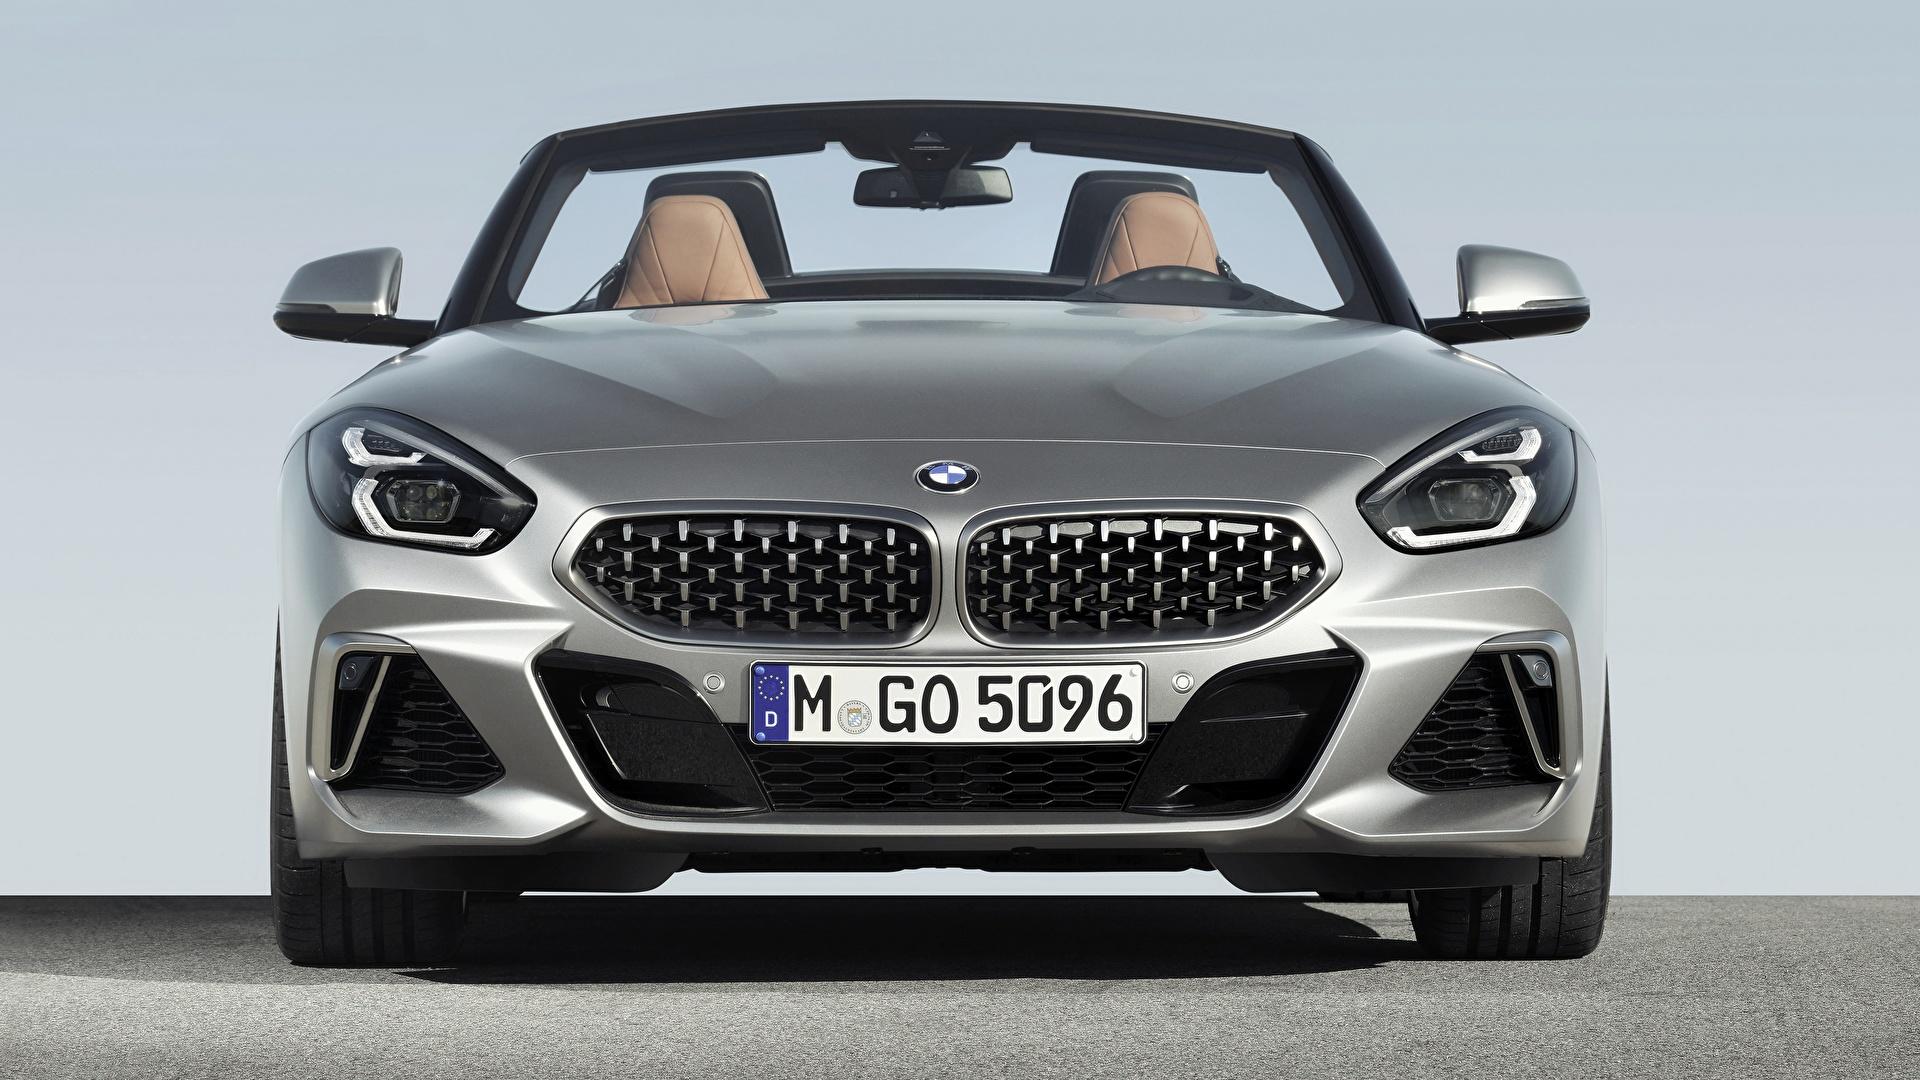 Обои для рабочего стола BMW Z4 M40i Z4 2019 G29 Родстер серебристая авто Спереди 1920x1080 БМВ серебряный серебряная Серебристый машина машины автомобиль Автомобили